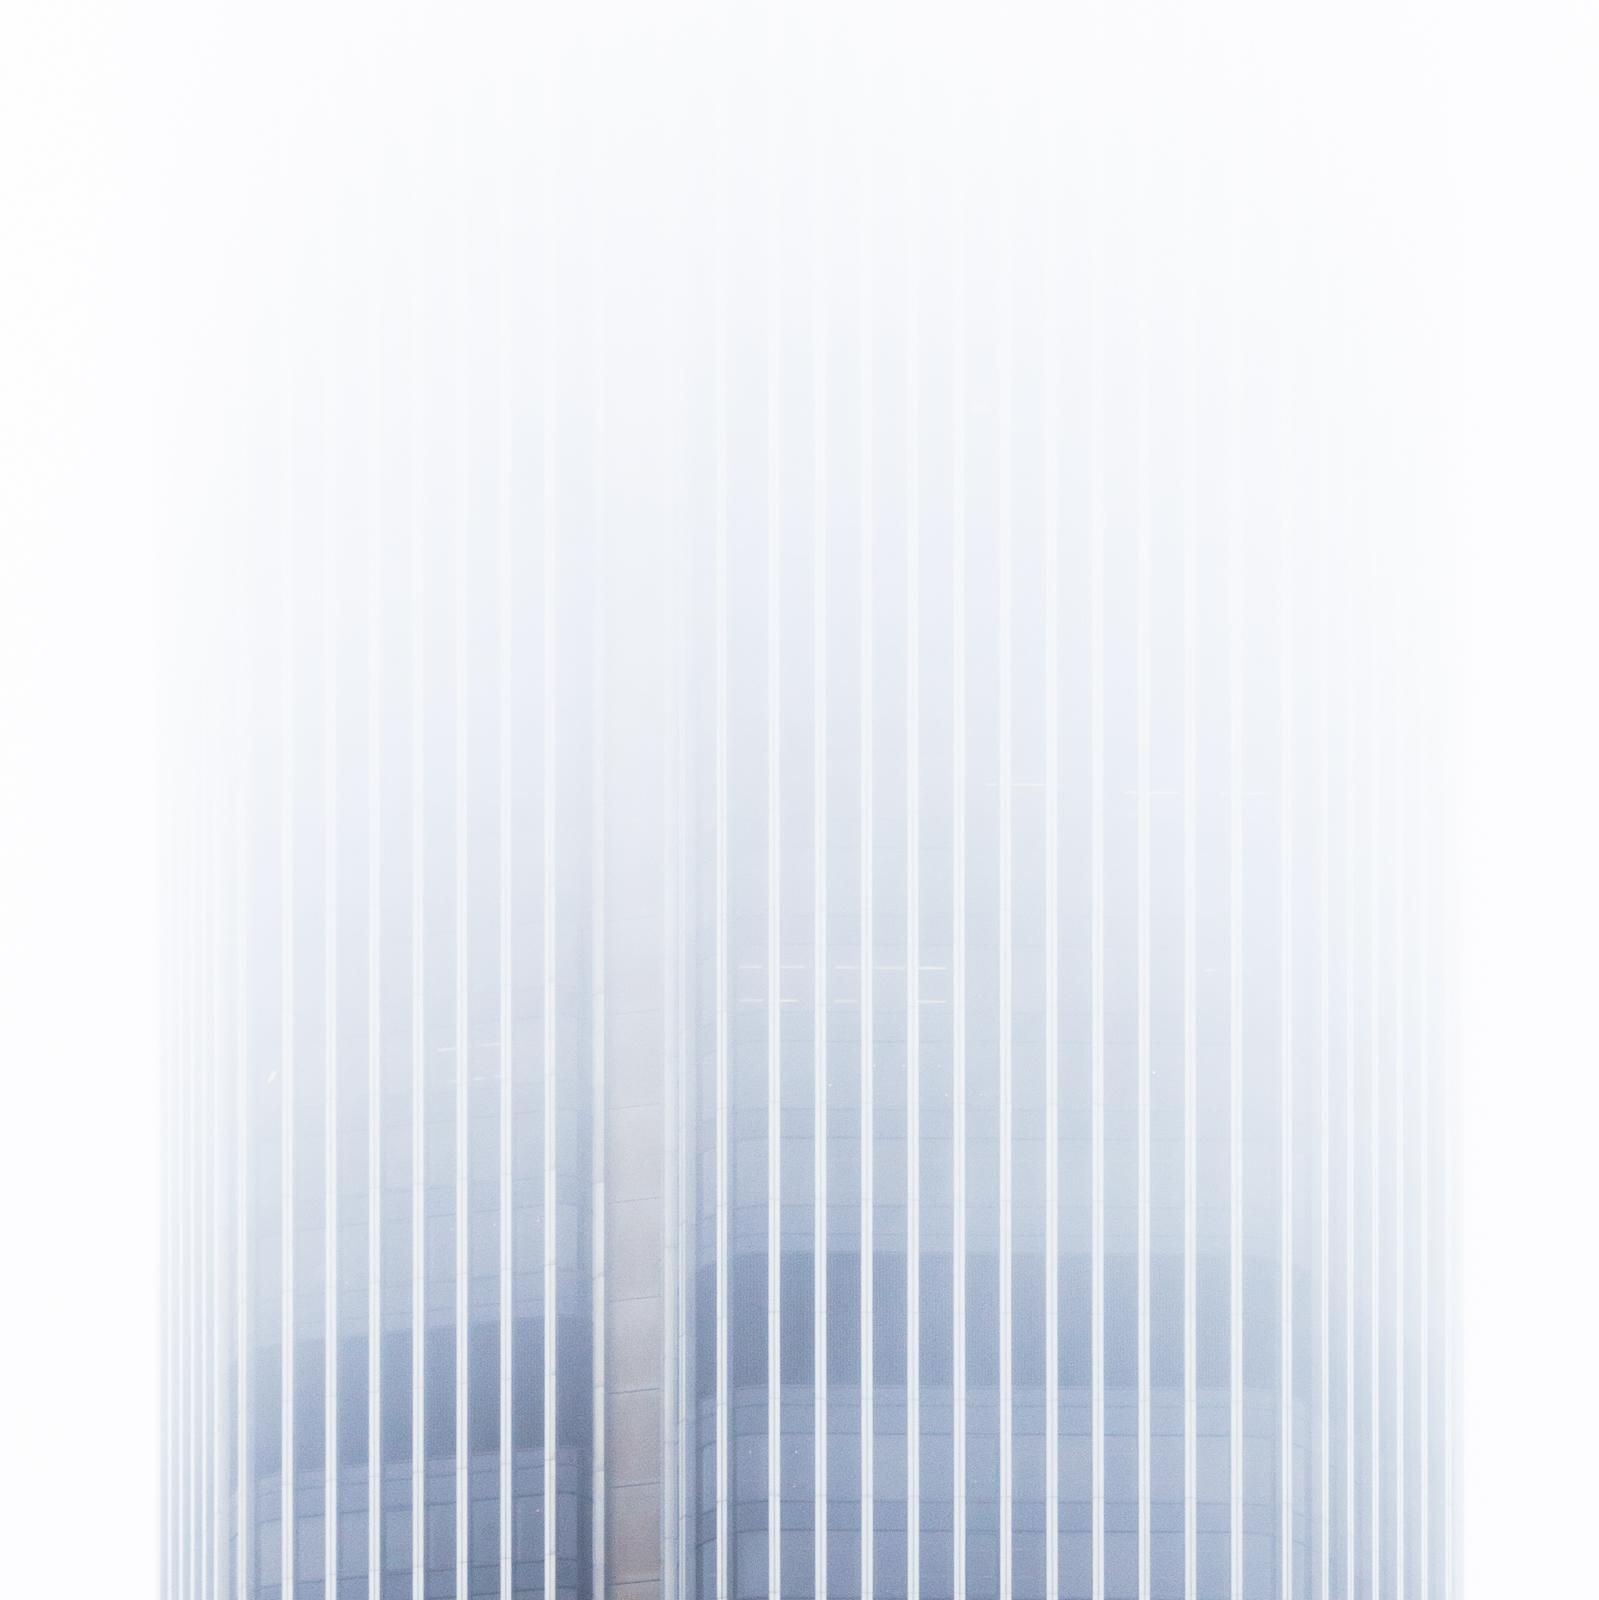 01@2x.jpg